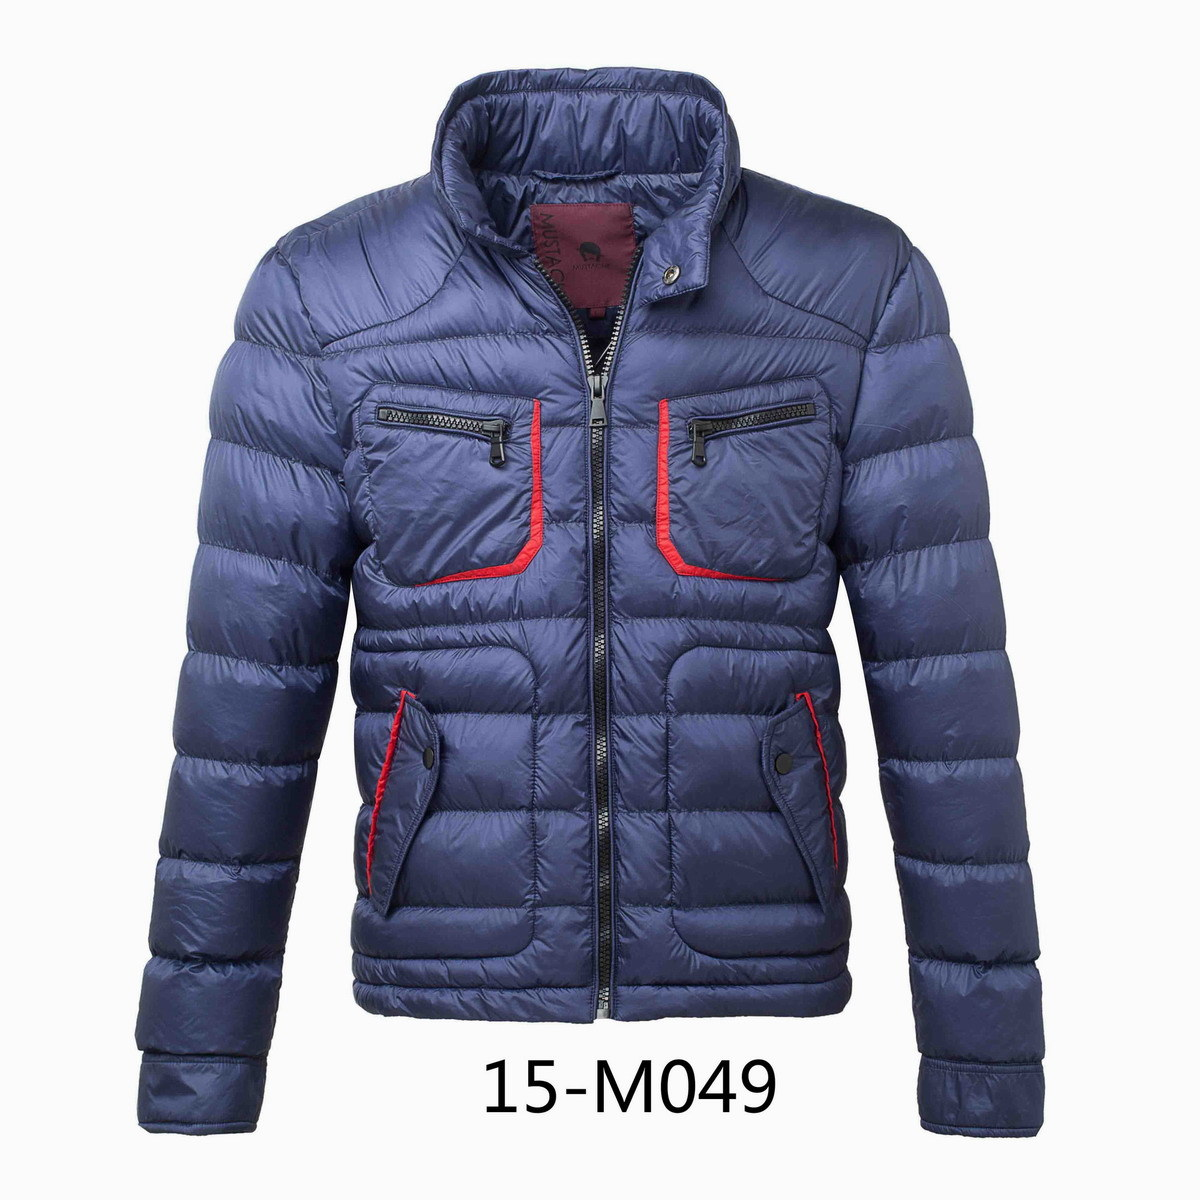 Men′s Calandered Nylon Padding Winer Jacket (15-M049)